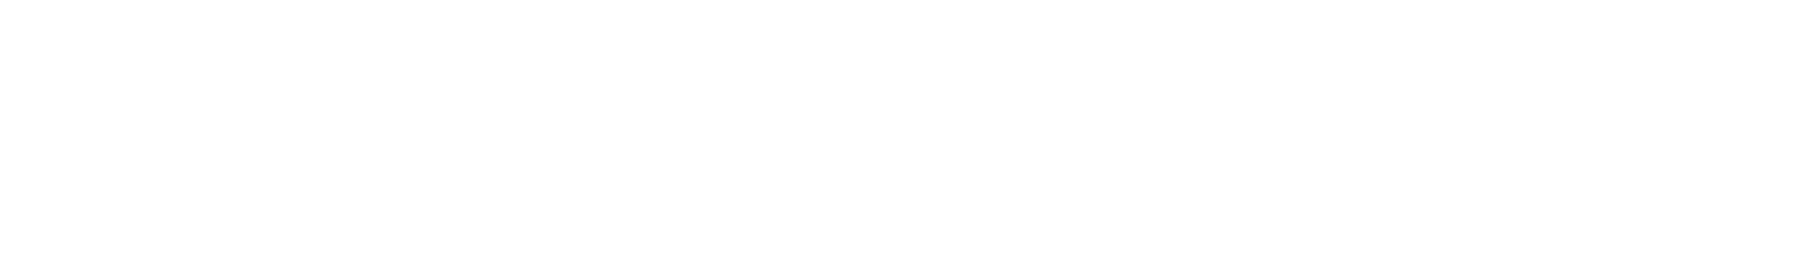 hnl 130 snares